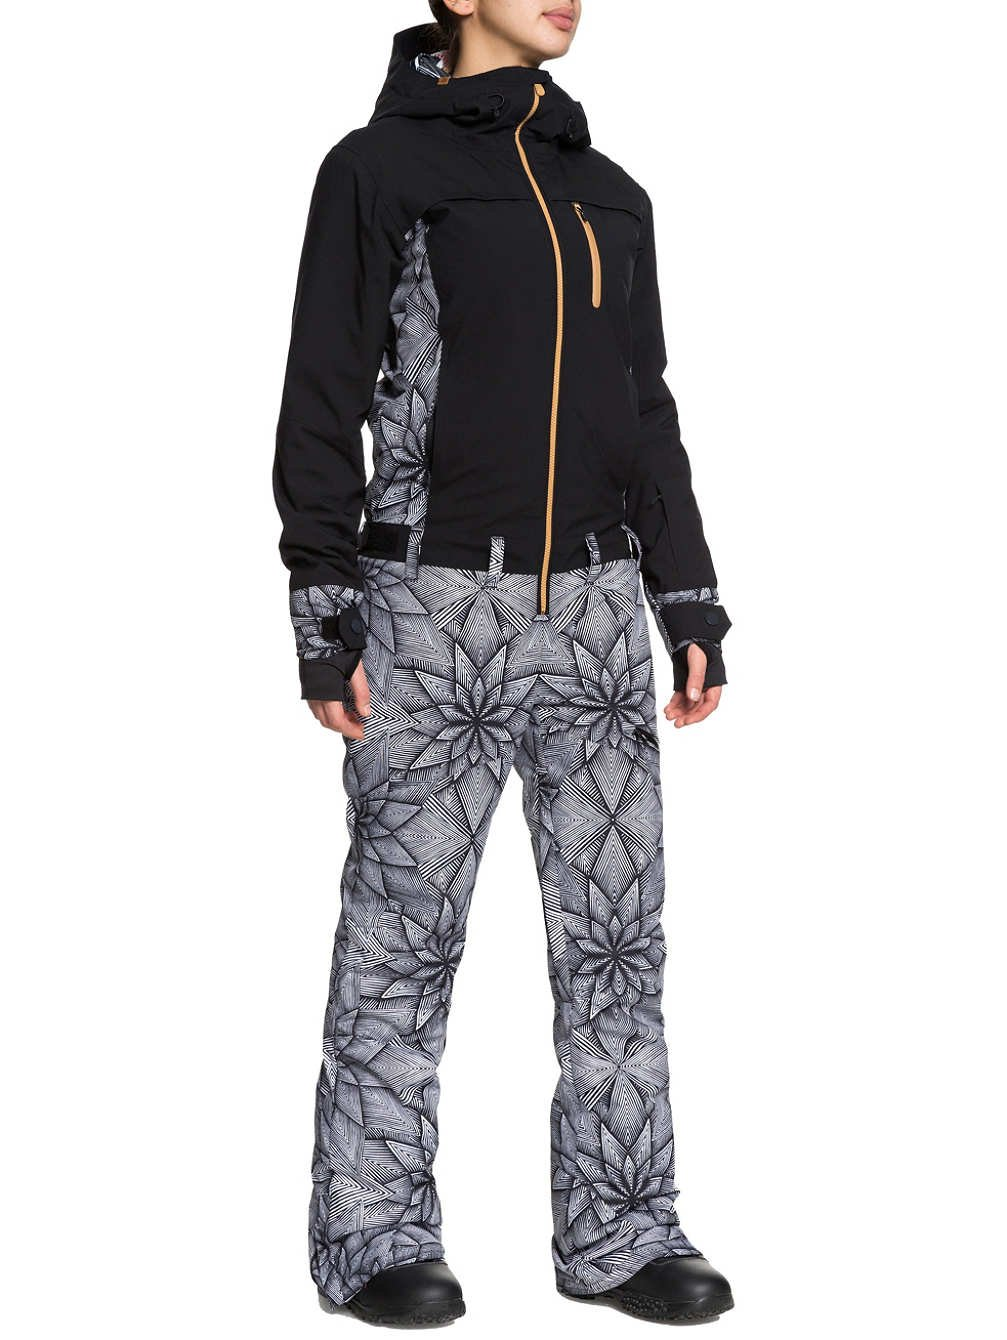 Roxy Illusion Suit